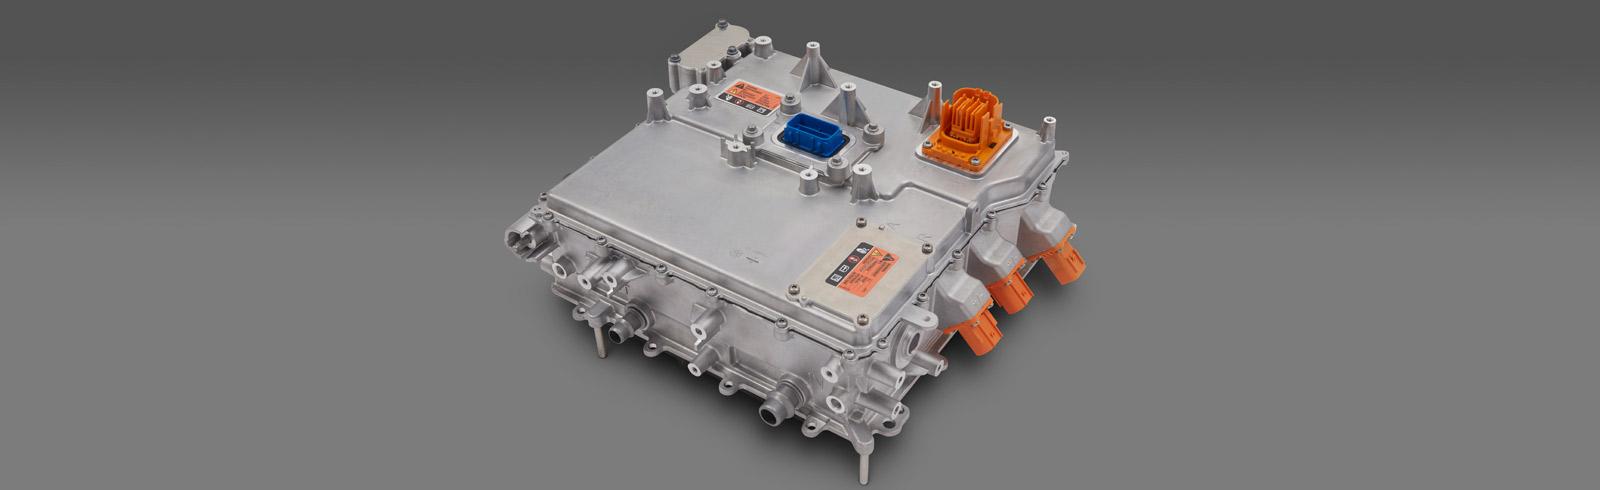 GM presented three all-new EV motors